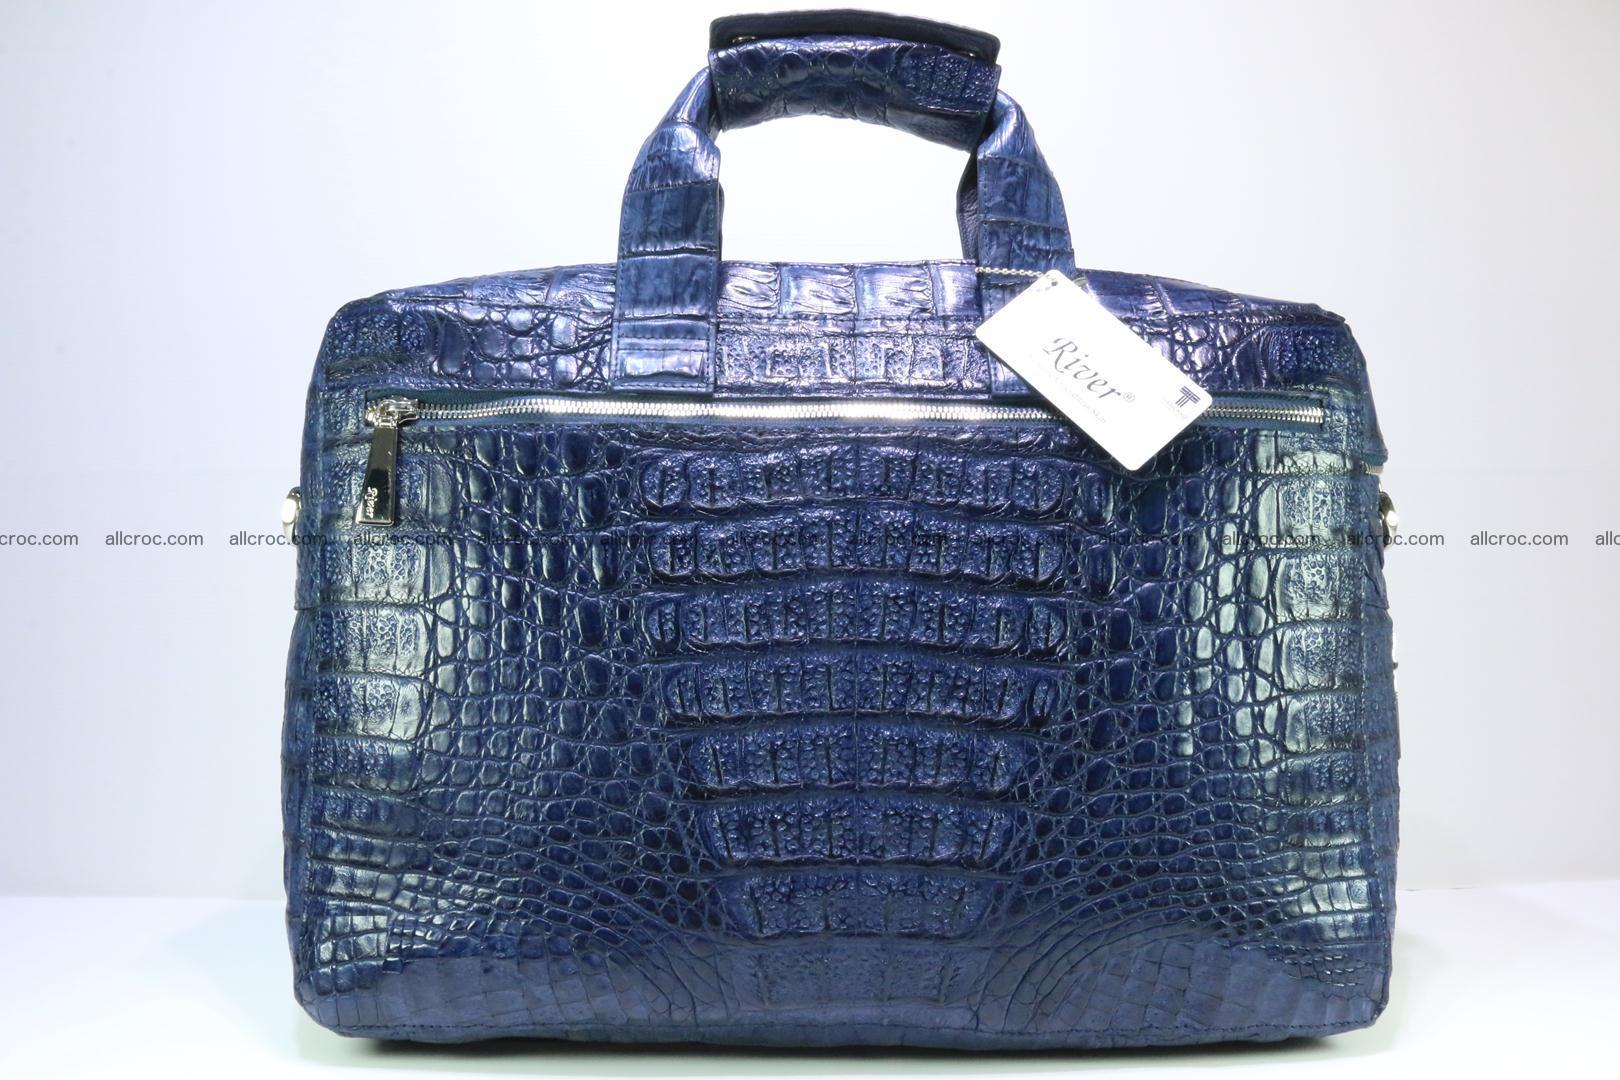 Crocodile skin handbag 423 Foto 6